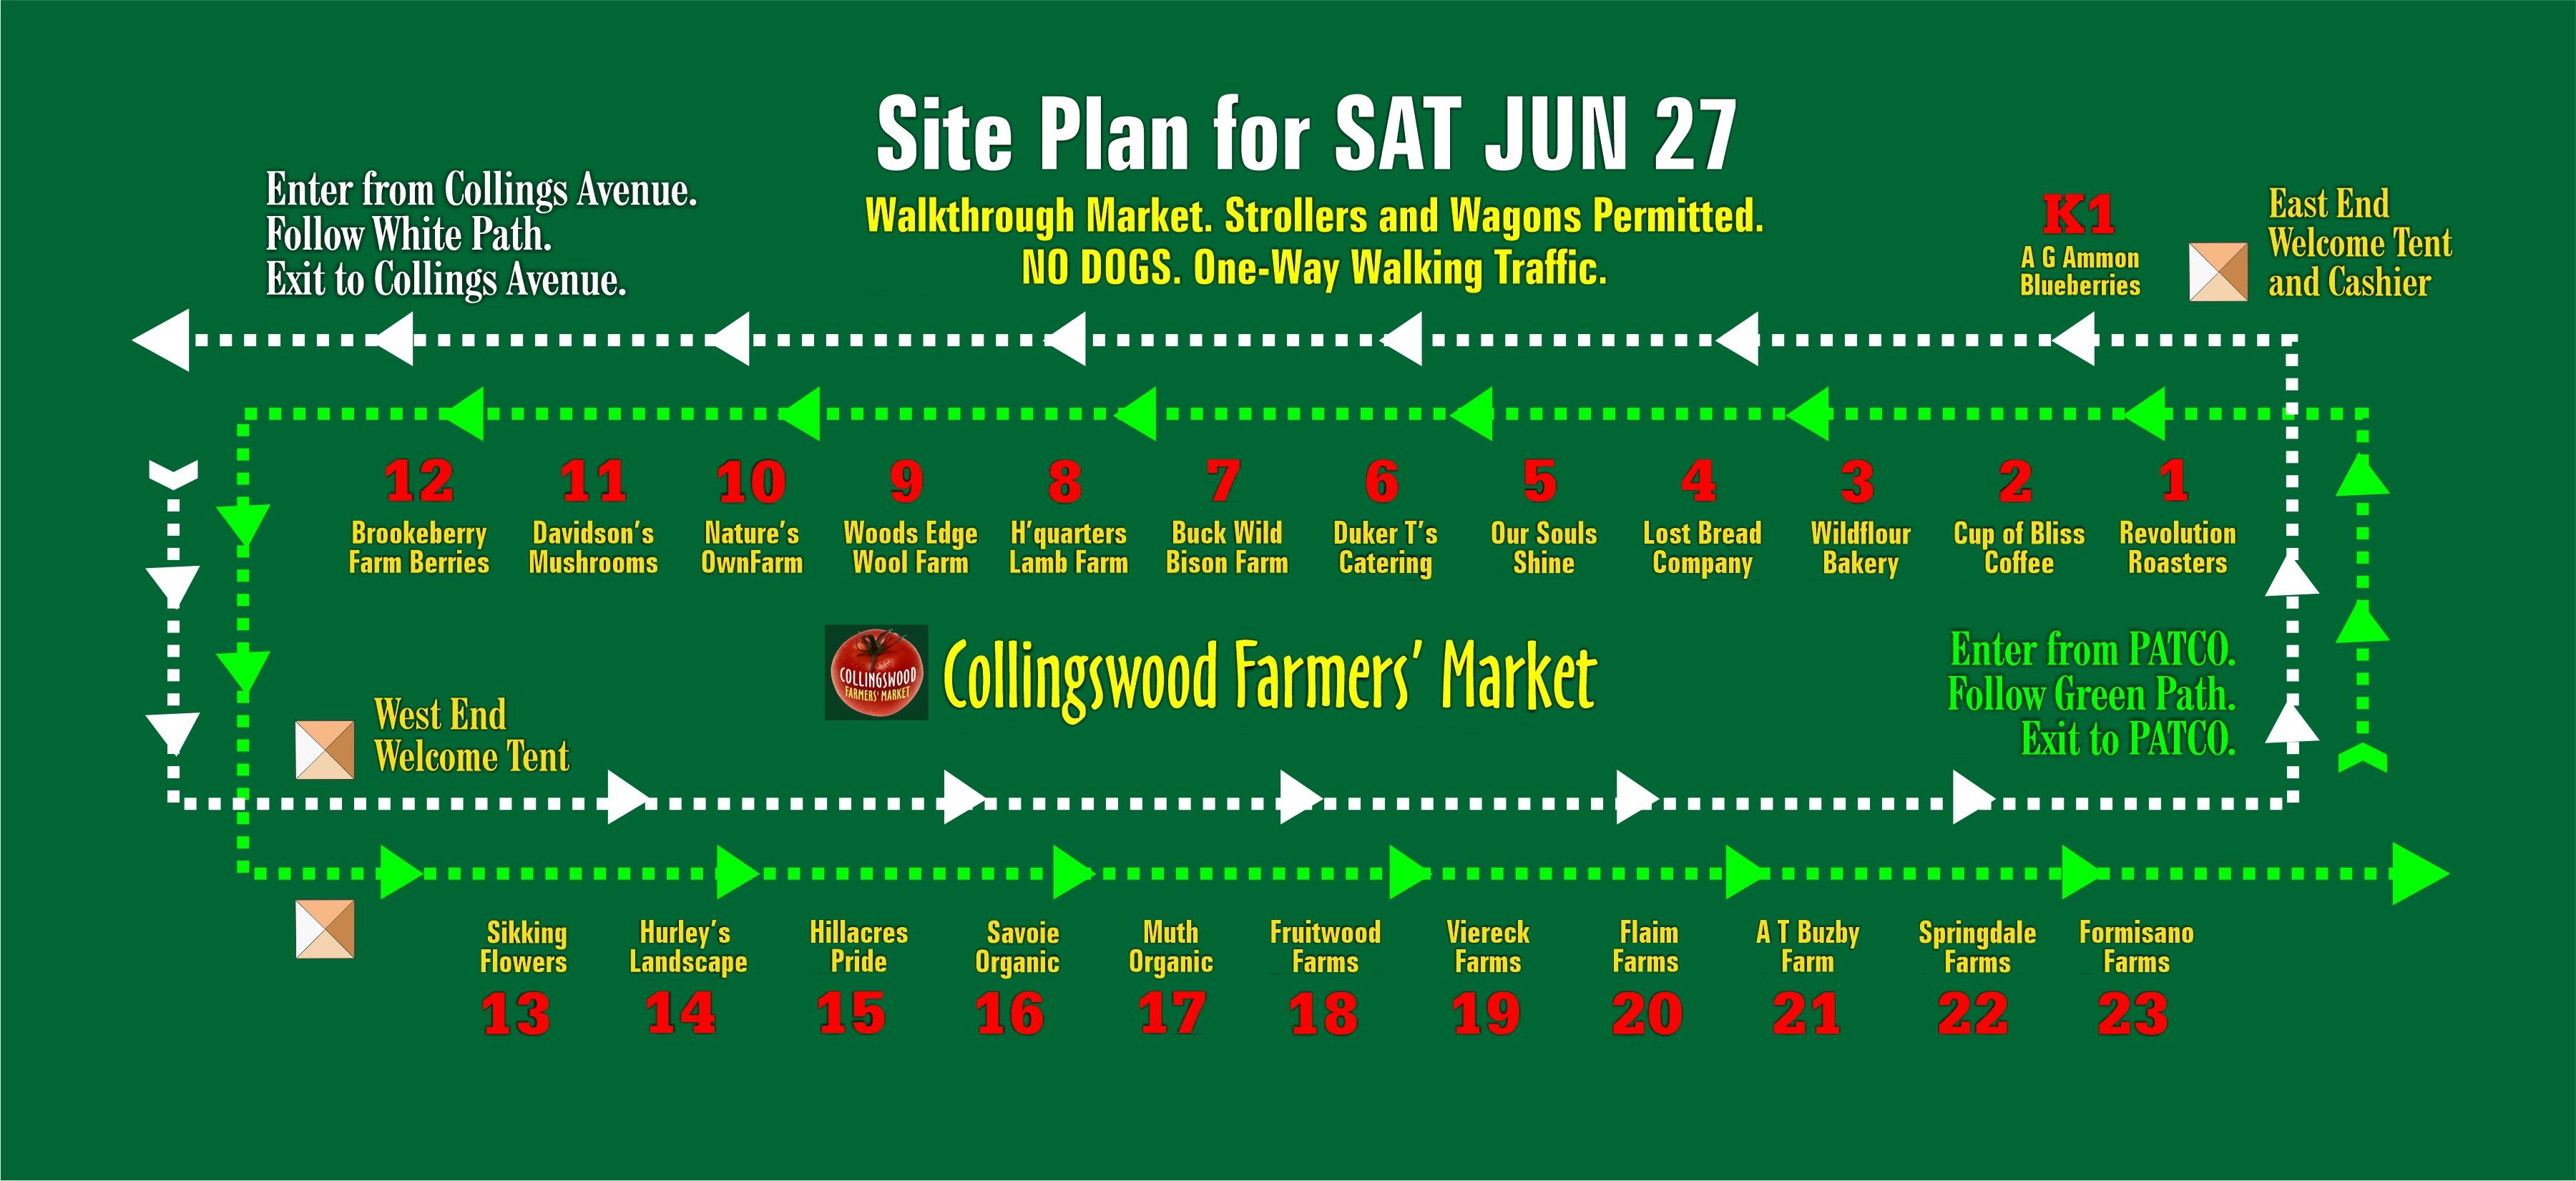 Site Plan for SAT JUN 27